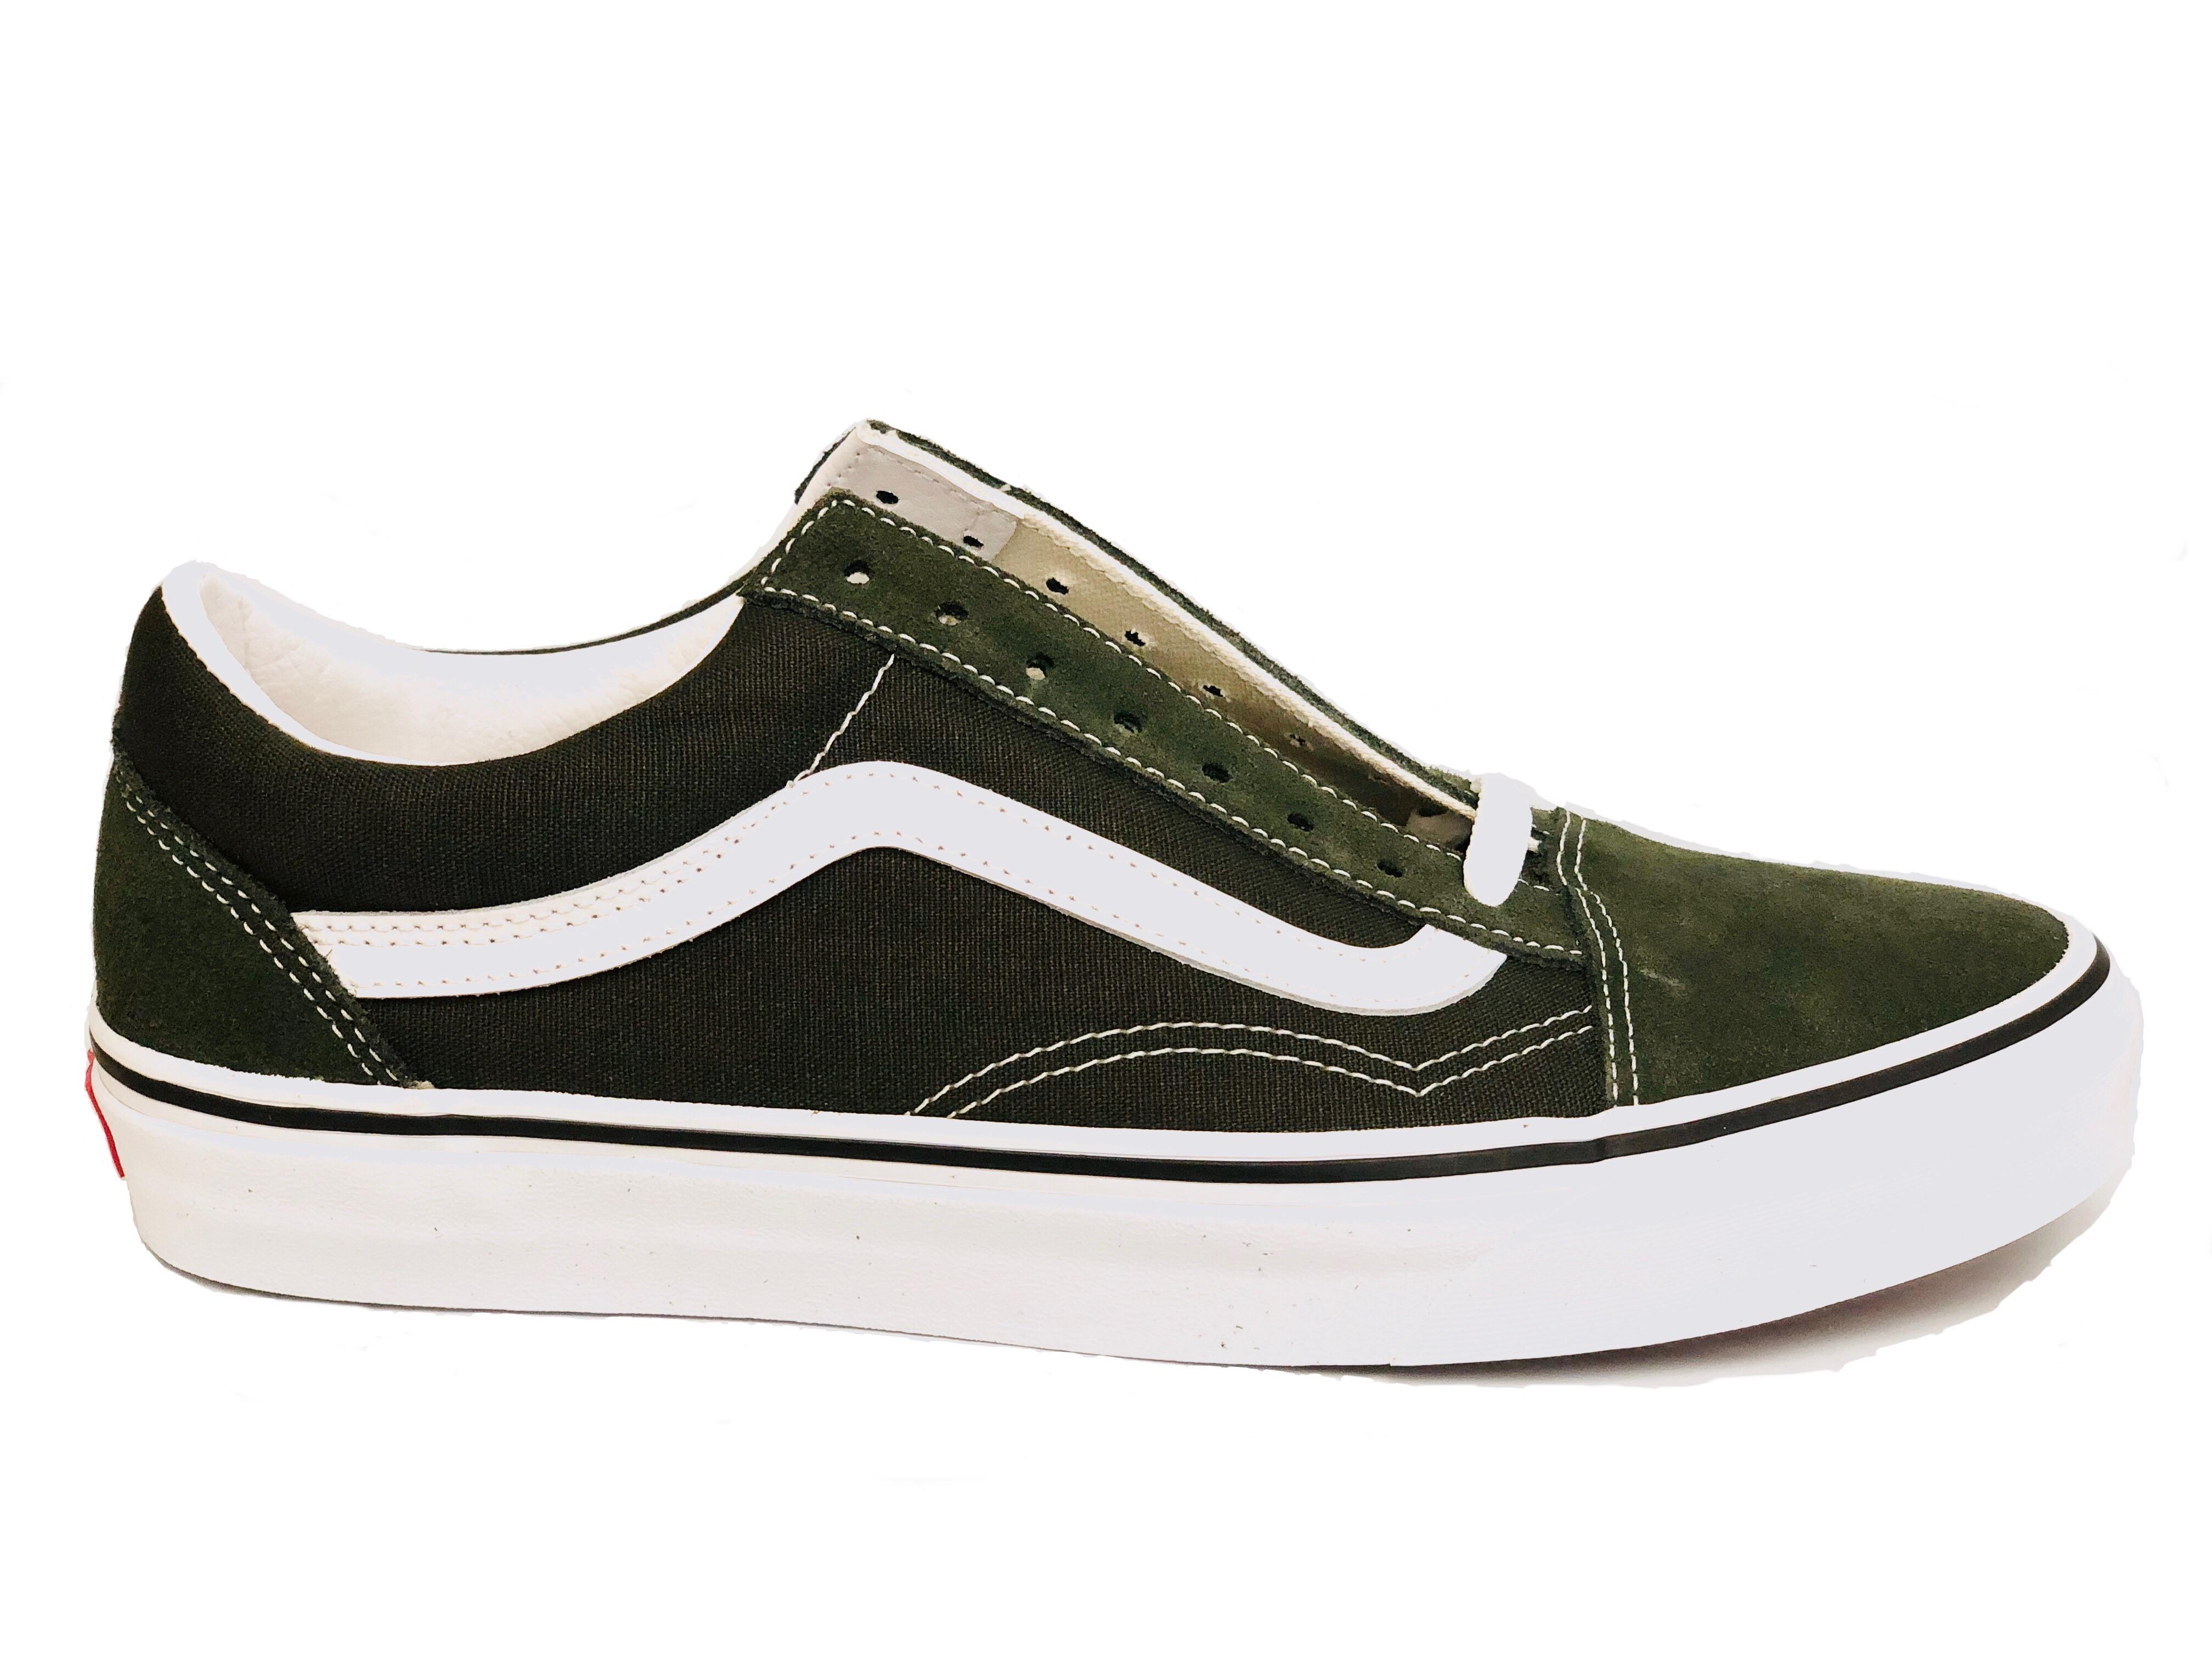 Details about Vans Men's Old Skool Sneakers, Forest Night True White Dark Green